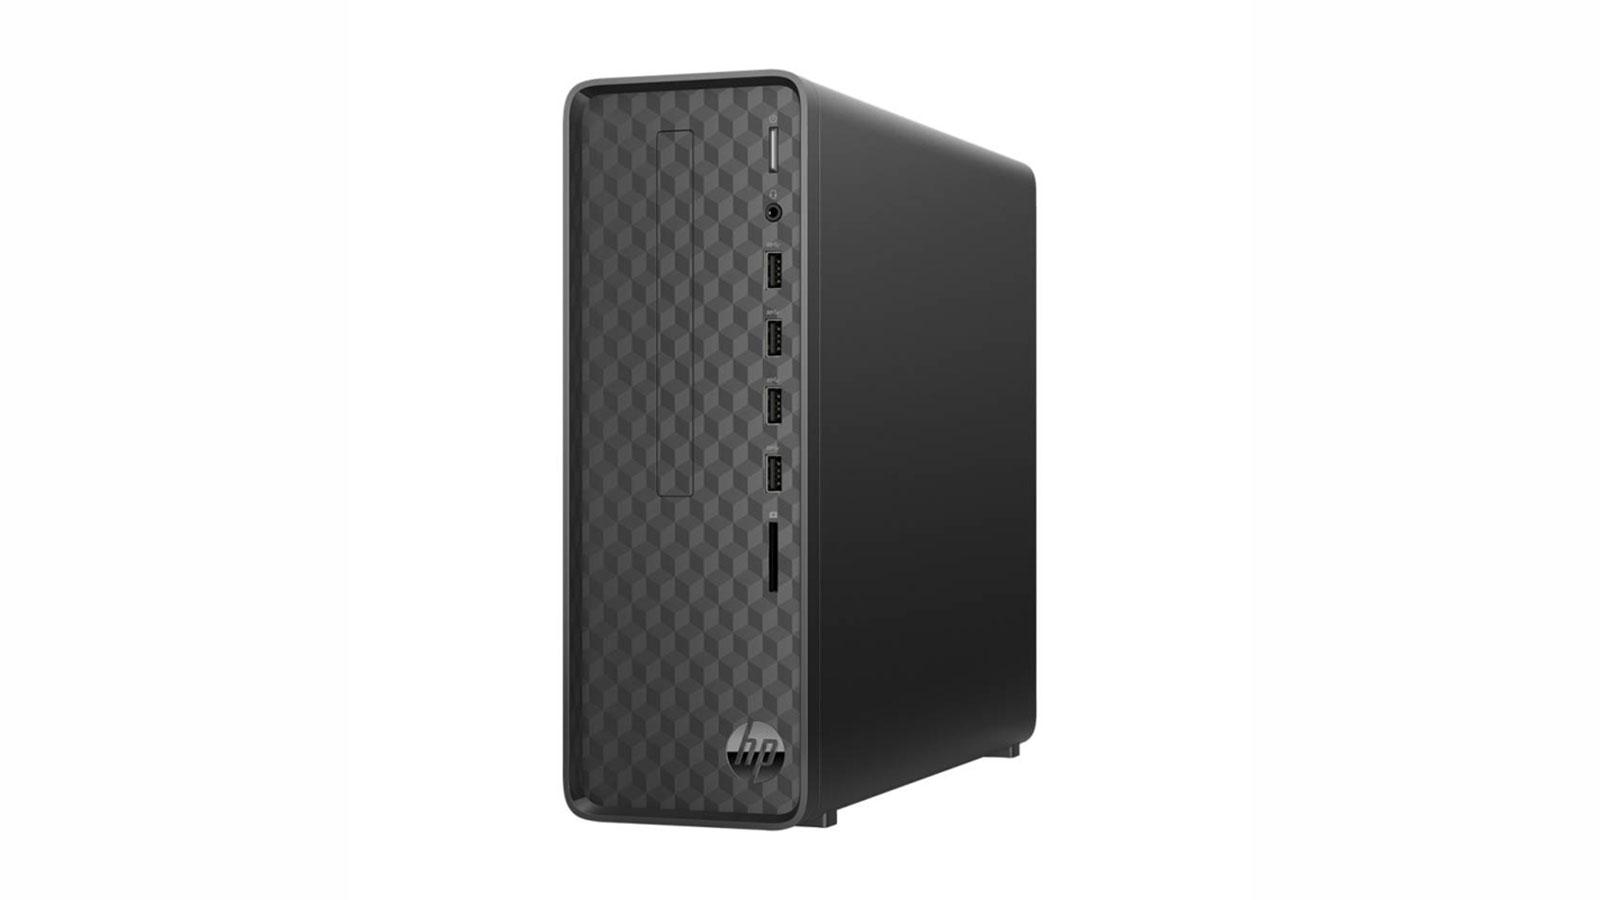 Desktop PC HP S01-pF1001nv